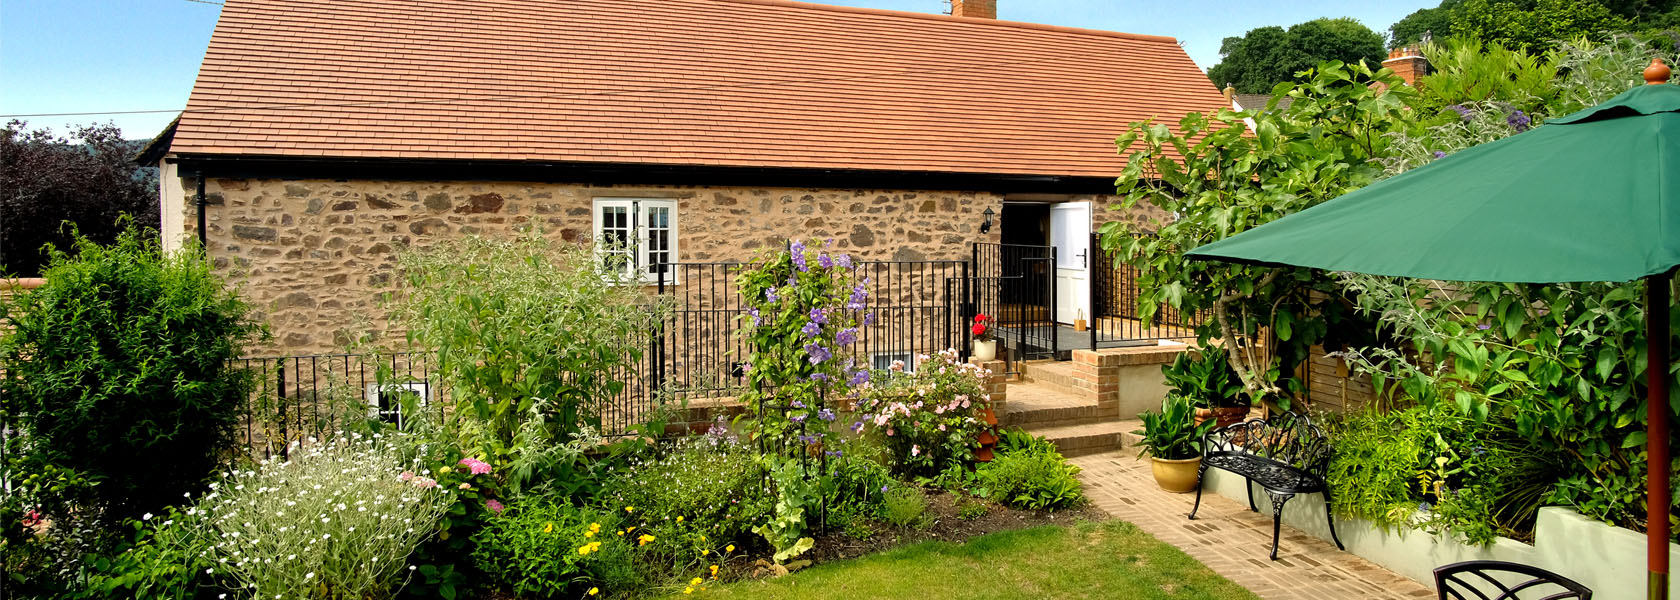 Property_StoneBarn_Garden_View_1680px